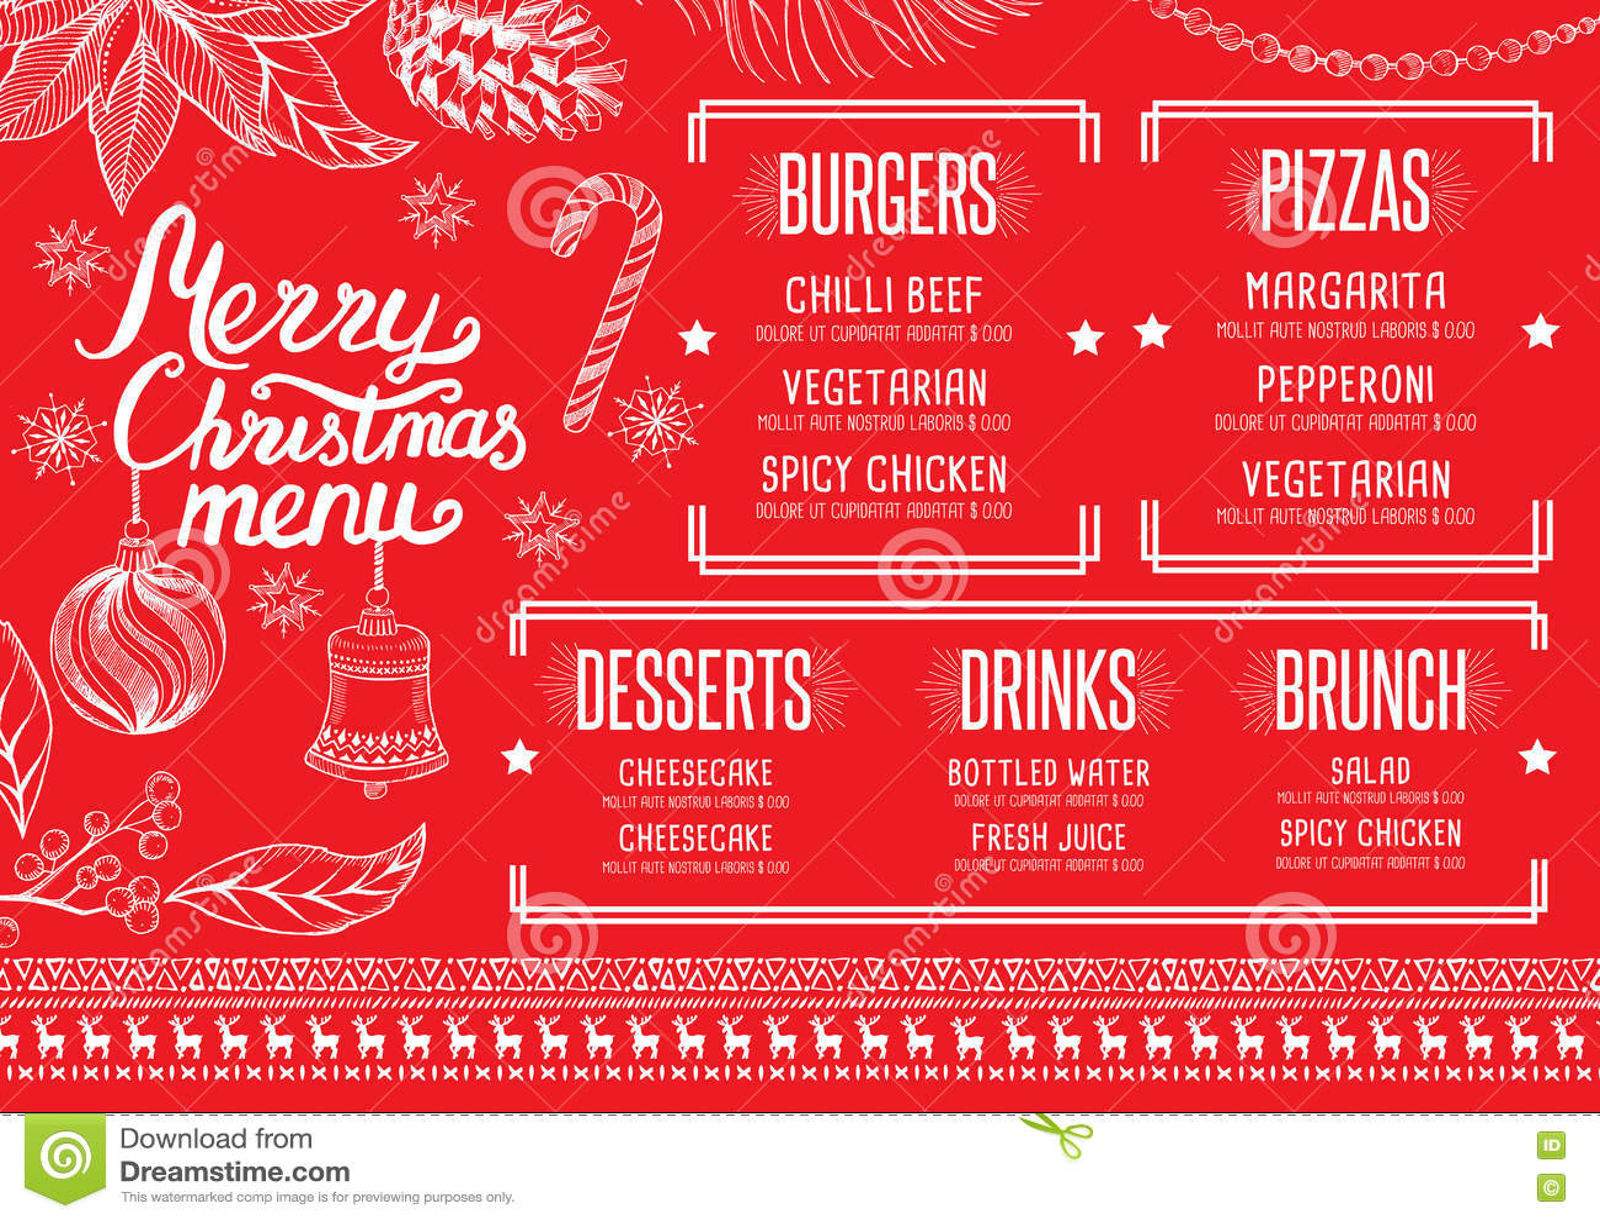 download christmas party invitation food menu restaurant stock vector illustration of blackboard